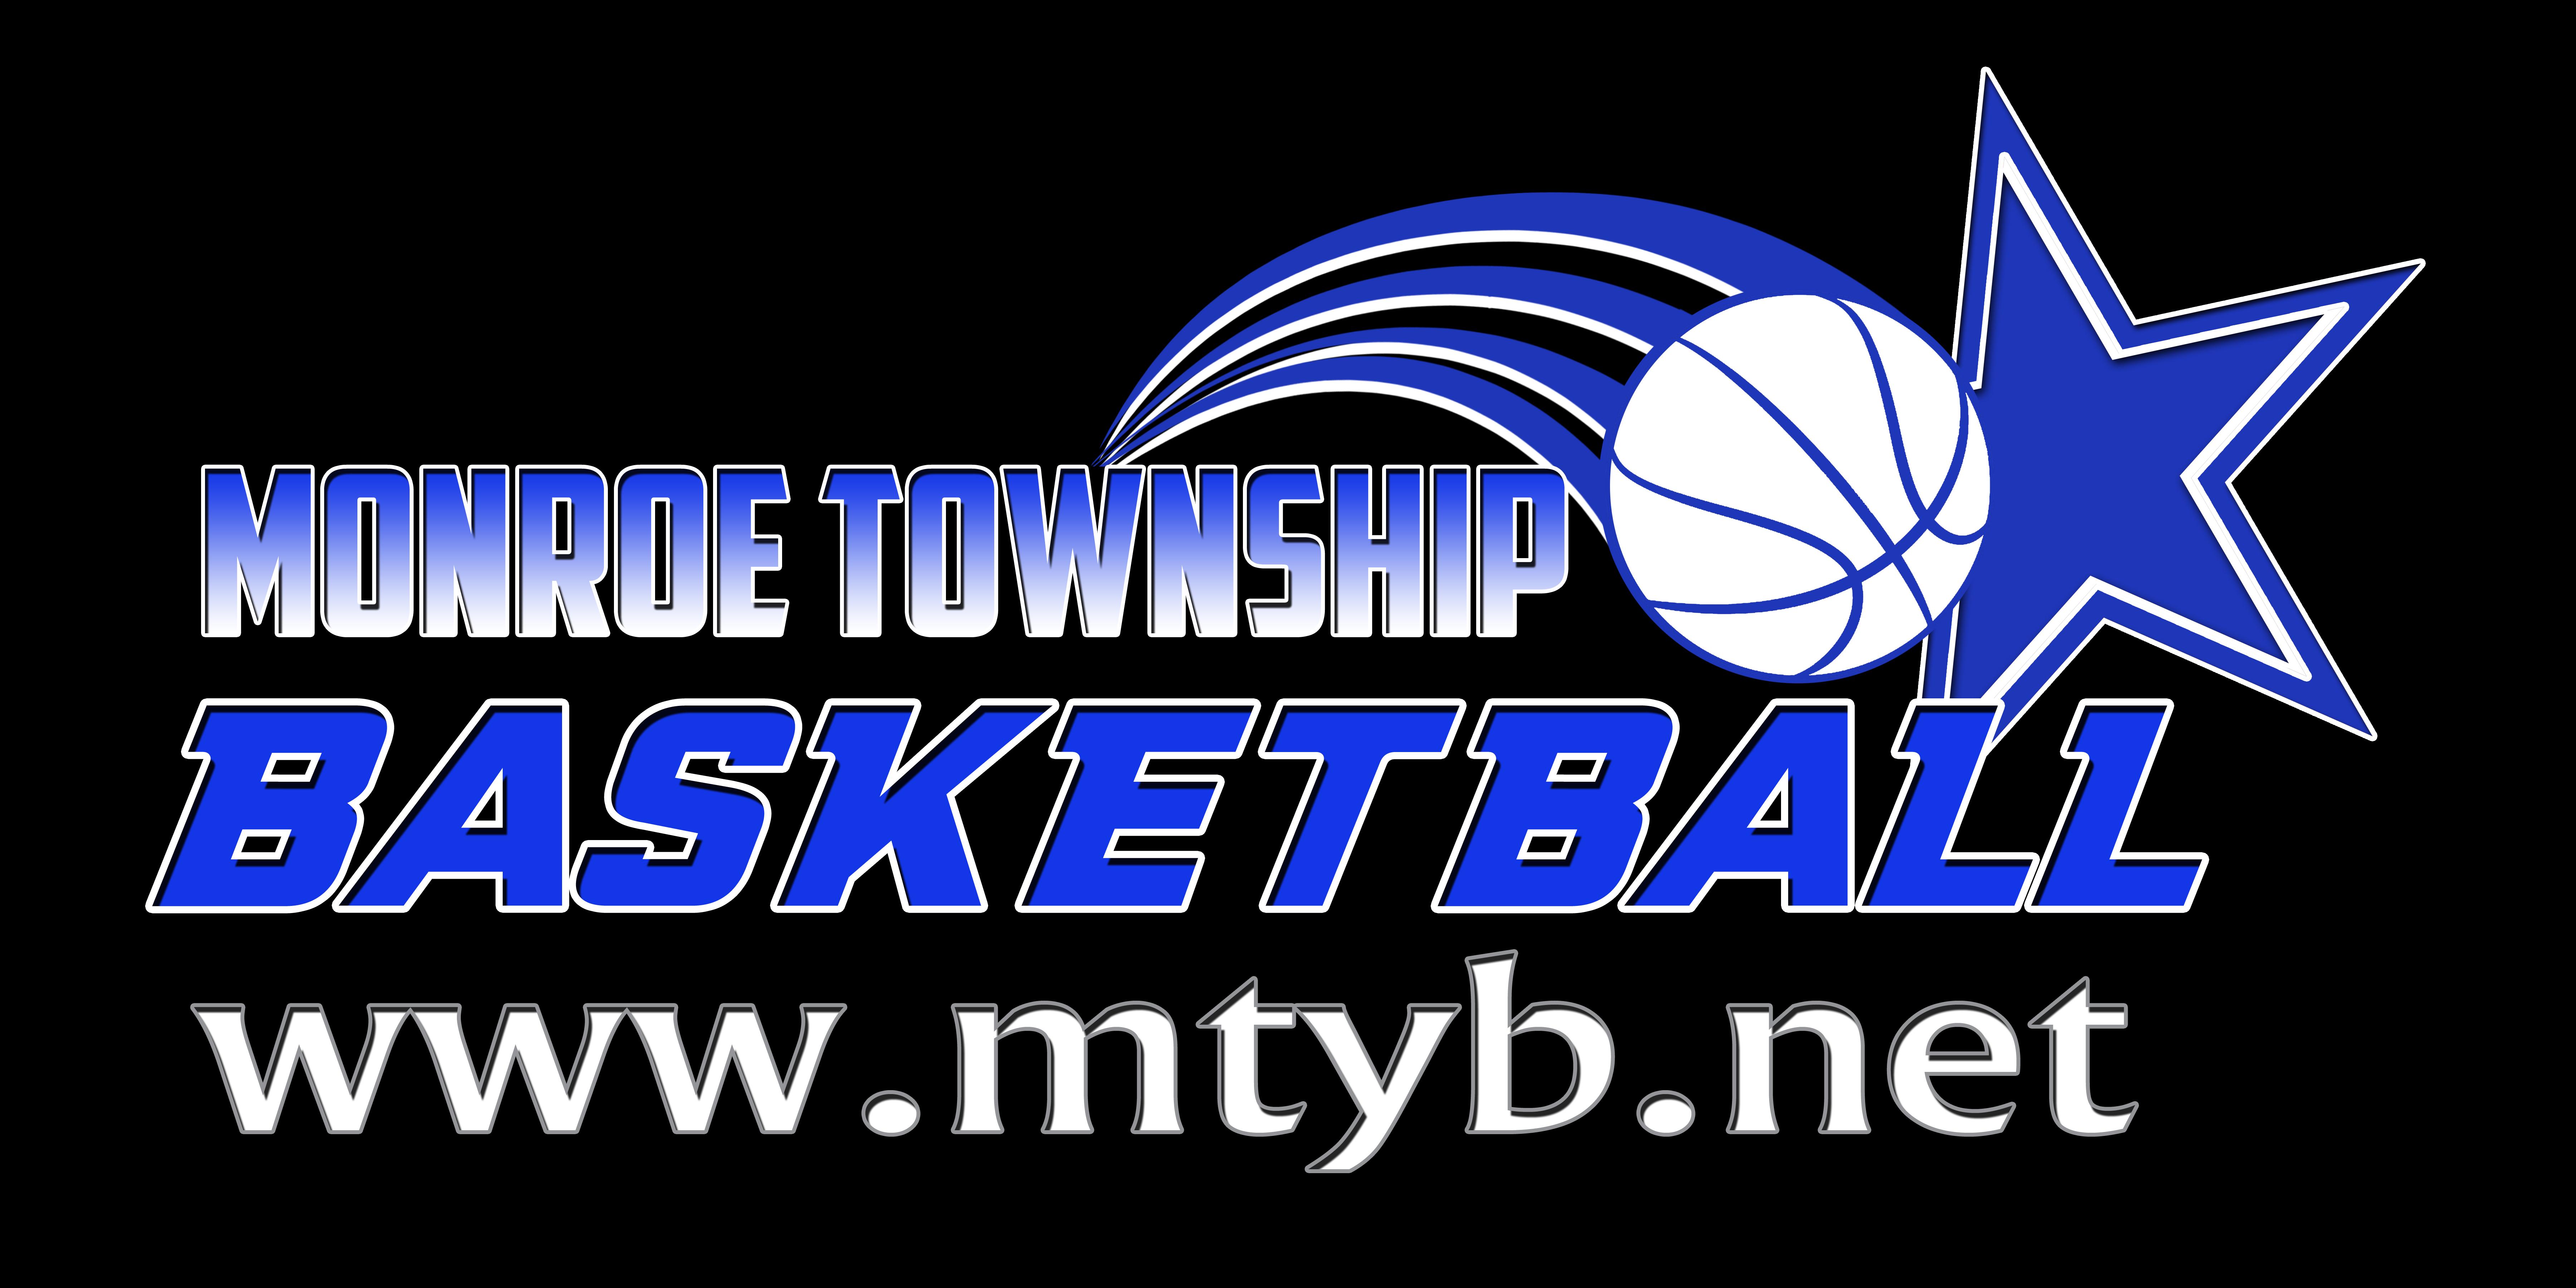 Monroe Township Basketball